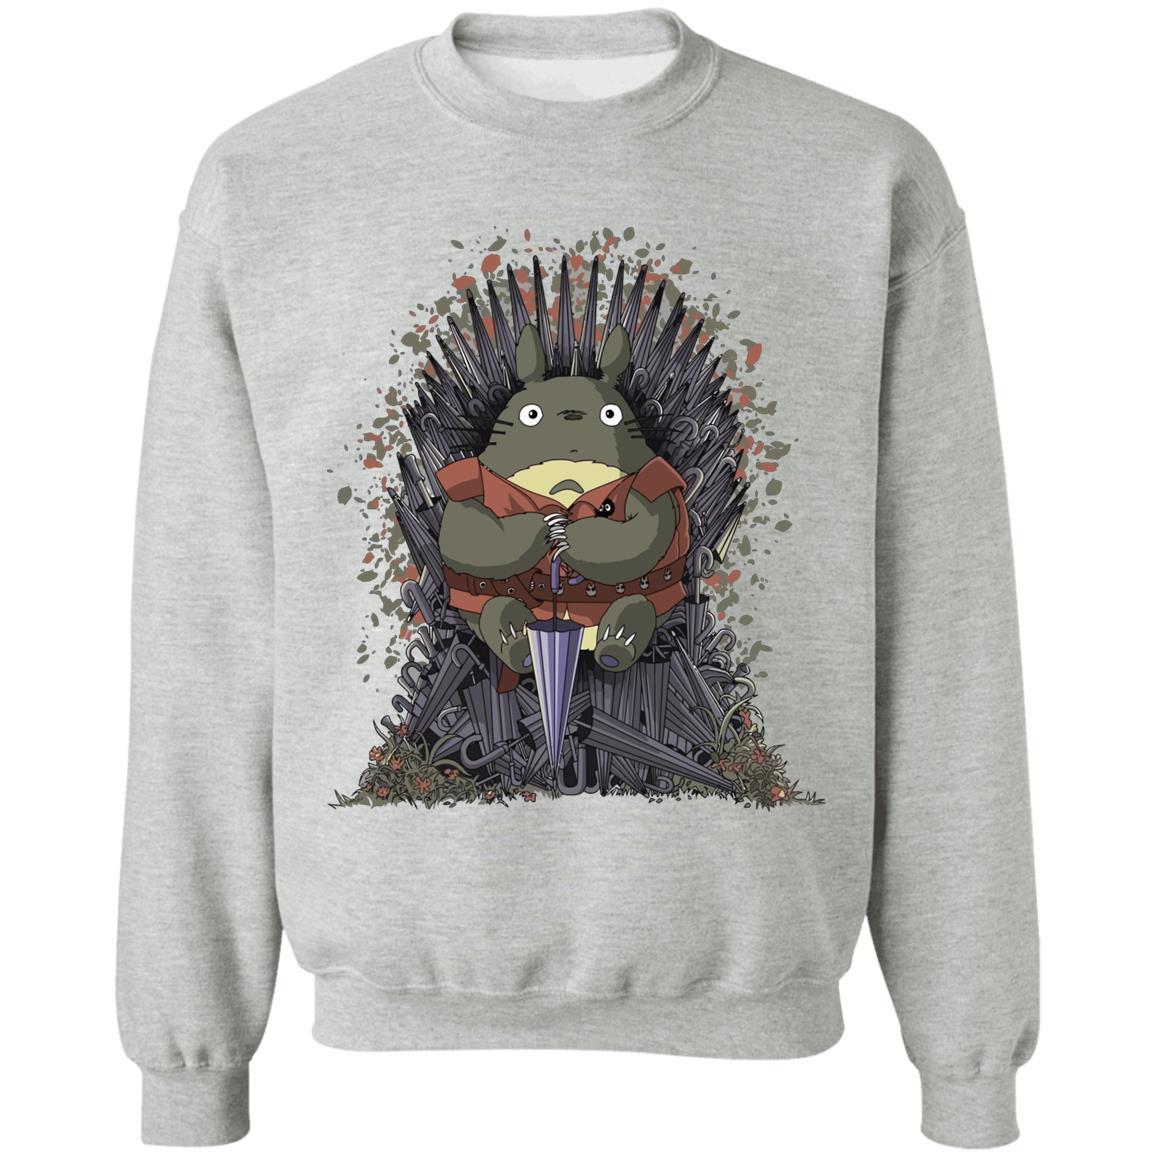 Totoro Game of Thrones Sweatshirt